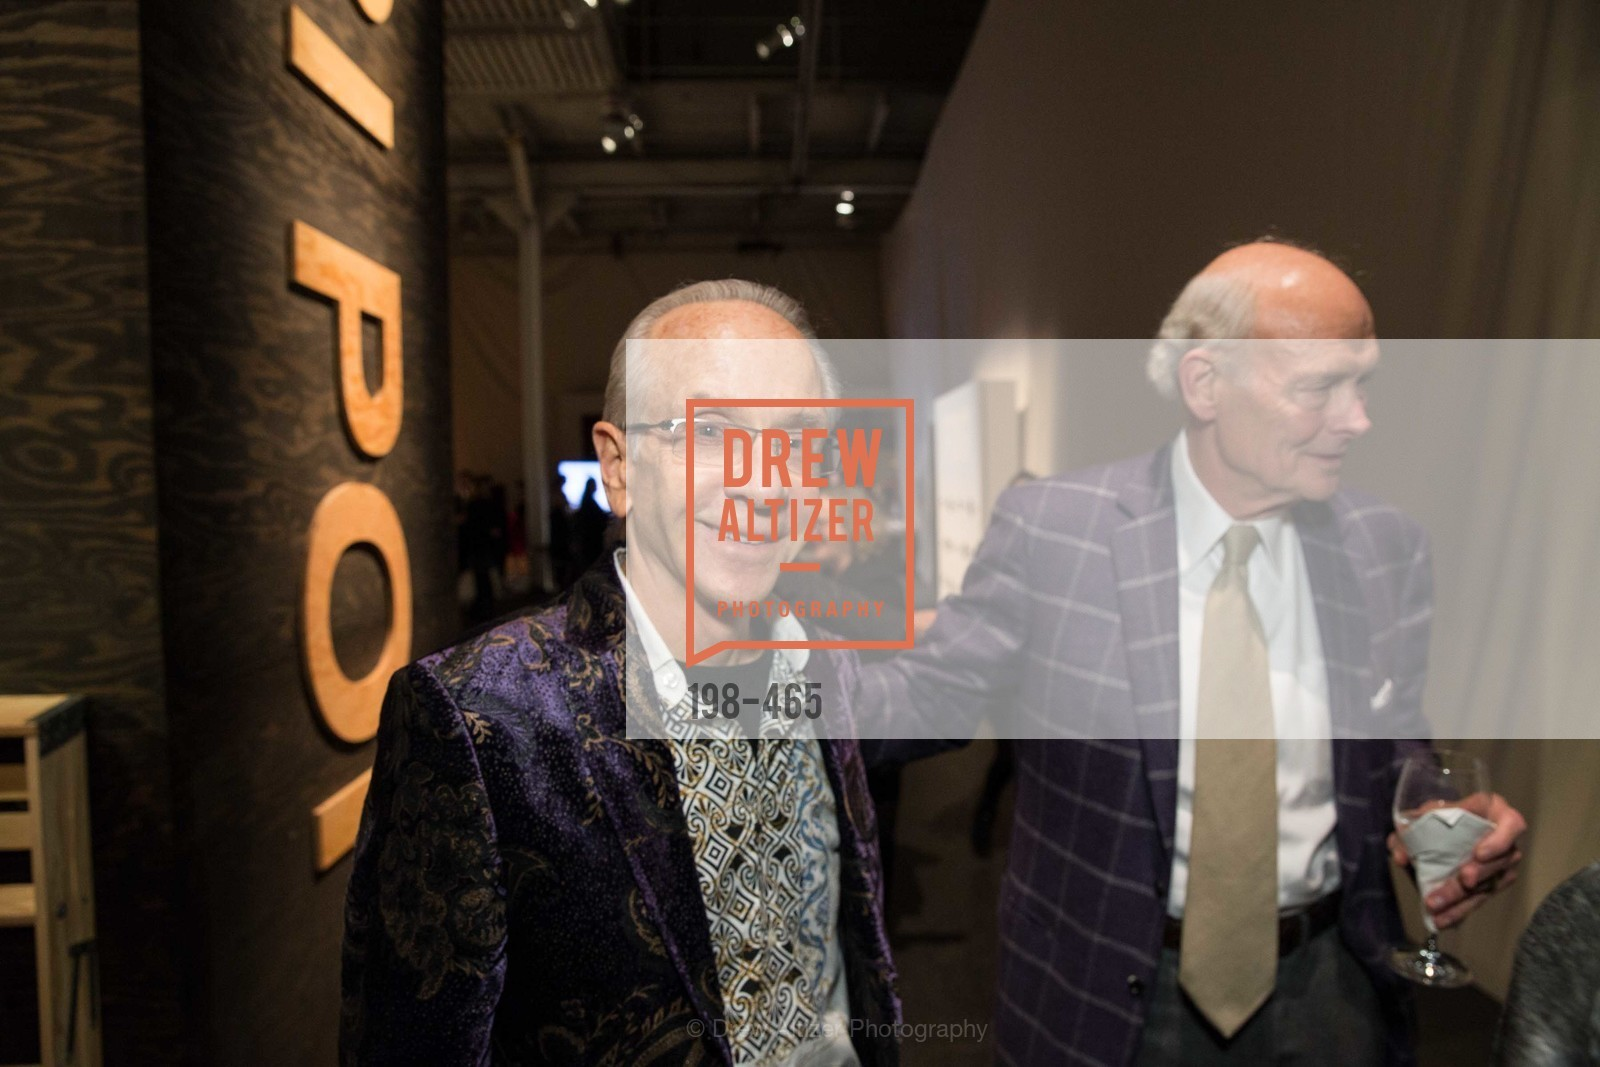 Norman Stone, Preston Butcher, FOG Design + Art Preview Gala, US. US, January 16th, 2014,Drew Altizer, Drew Altizer Photography, full-service agency, private events, San Francisco photographer, photographer california